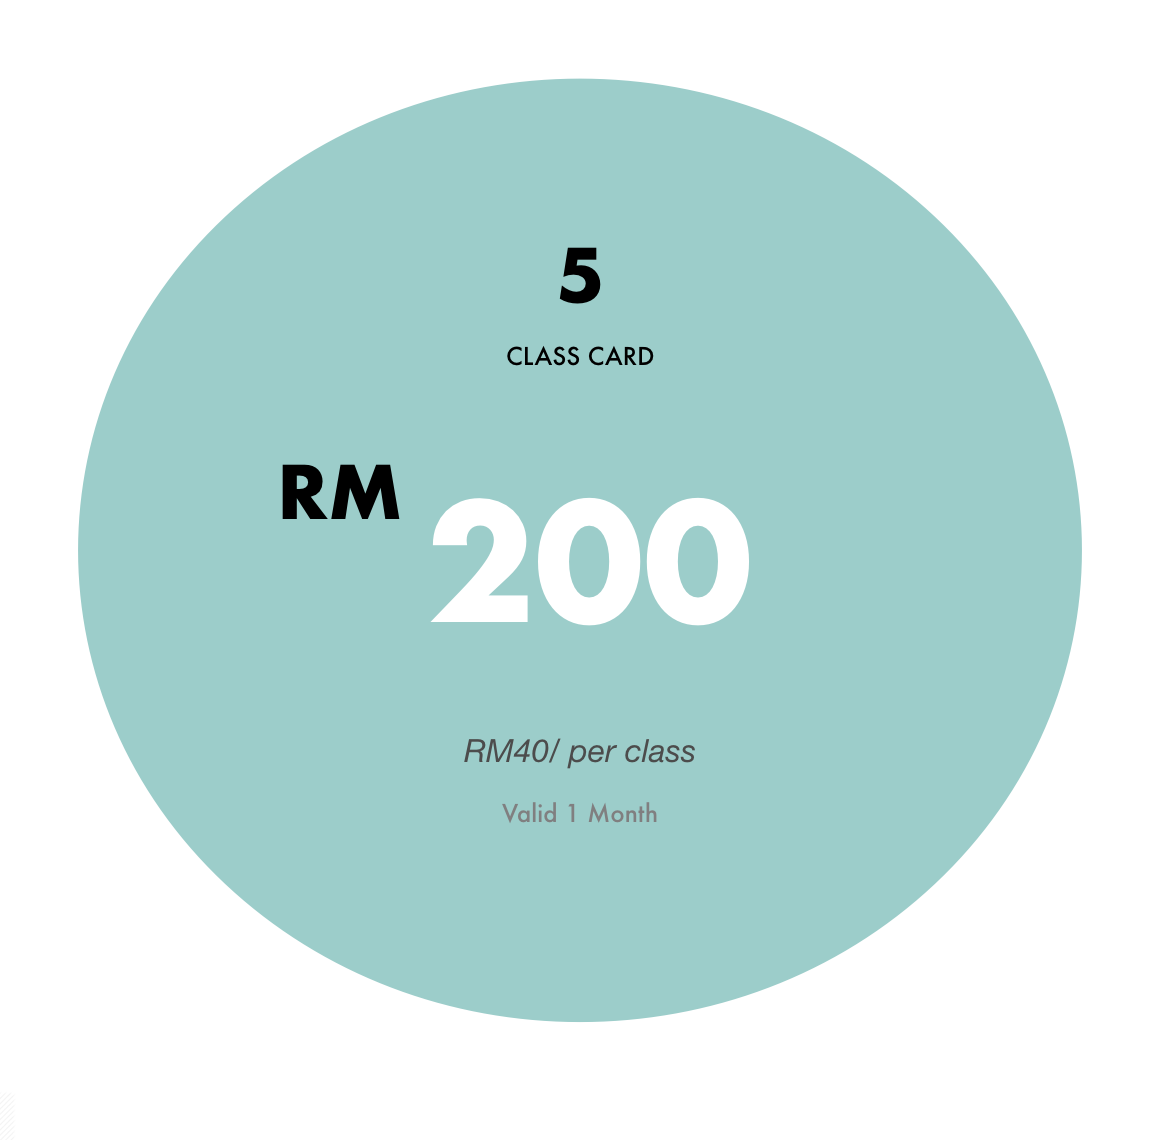 MYR30 Per Class